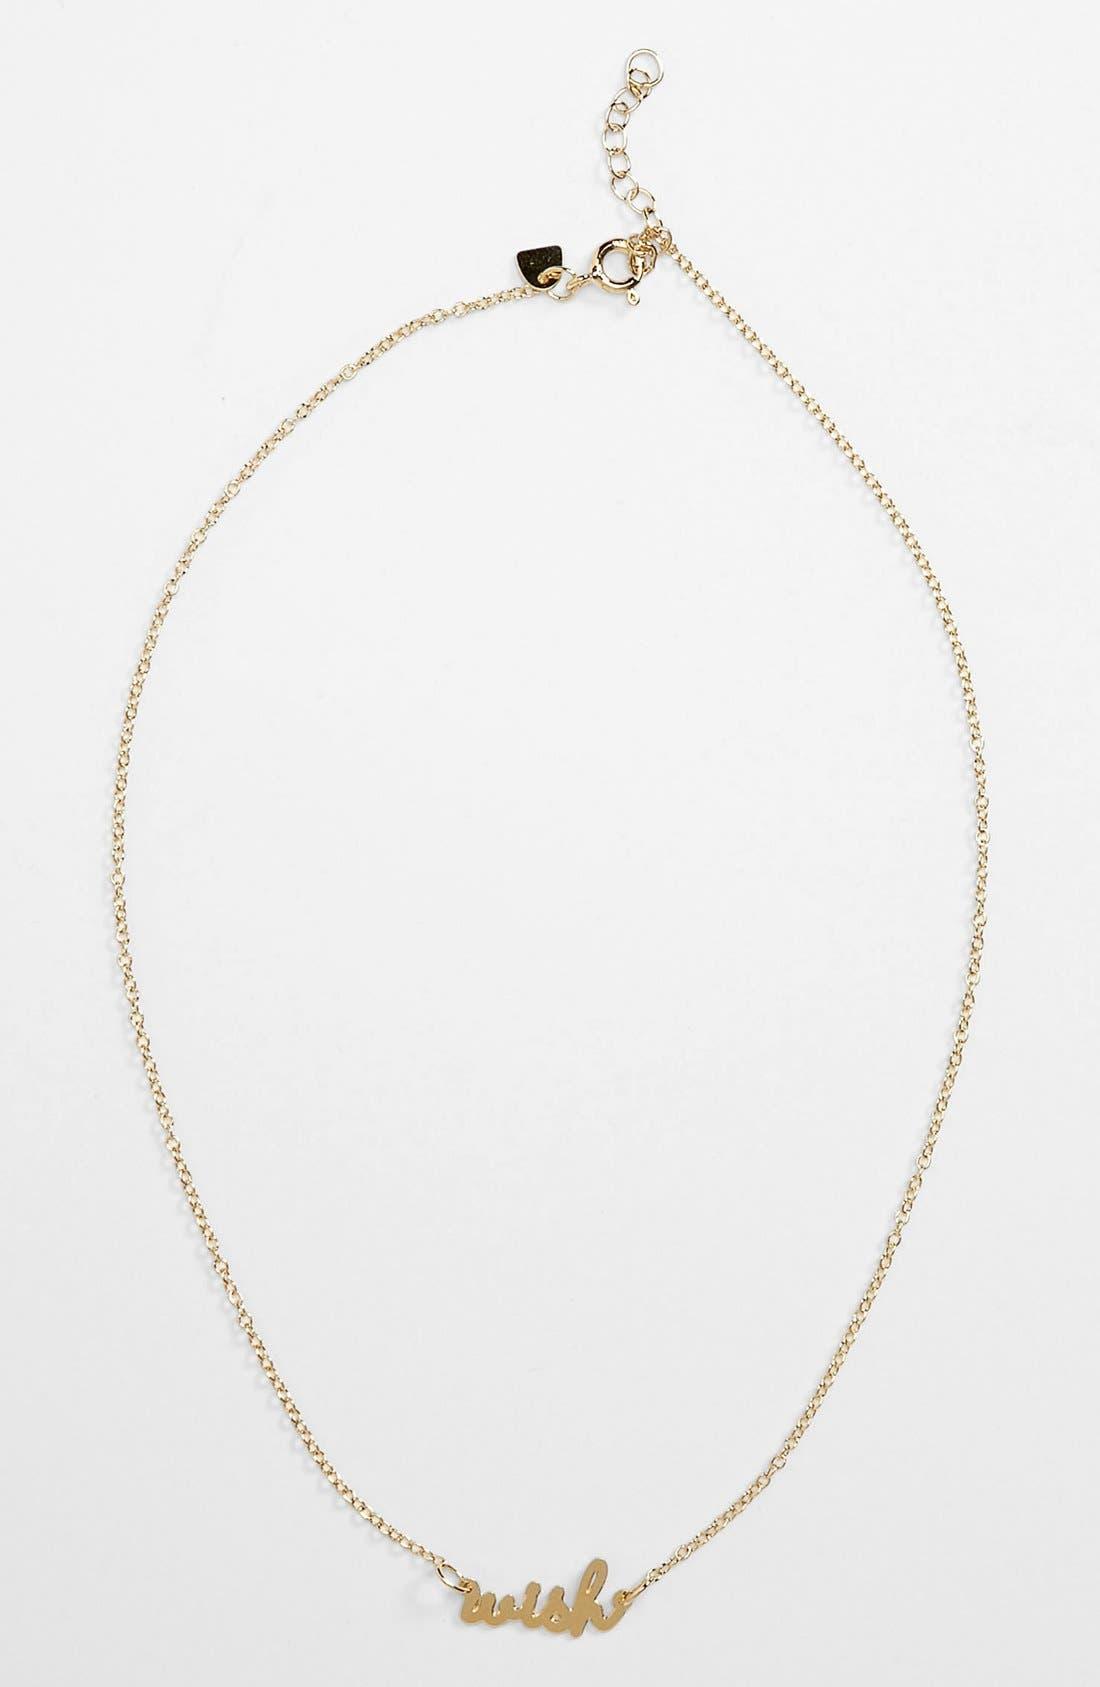 Main Image - 100% Gumdrop 'Word Up! - Wish' Necklace (Girls)